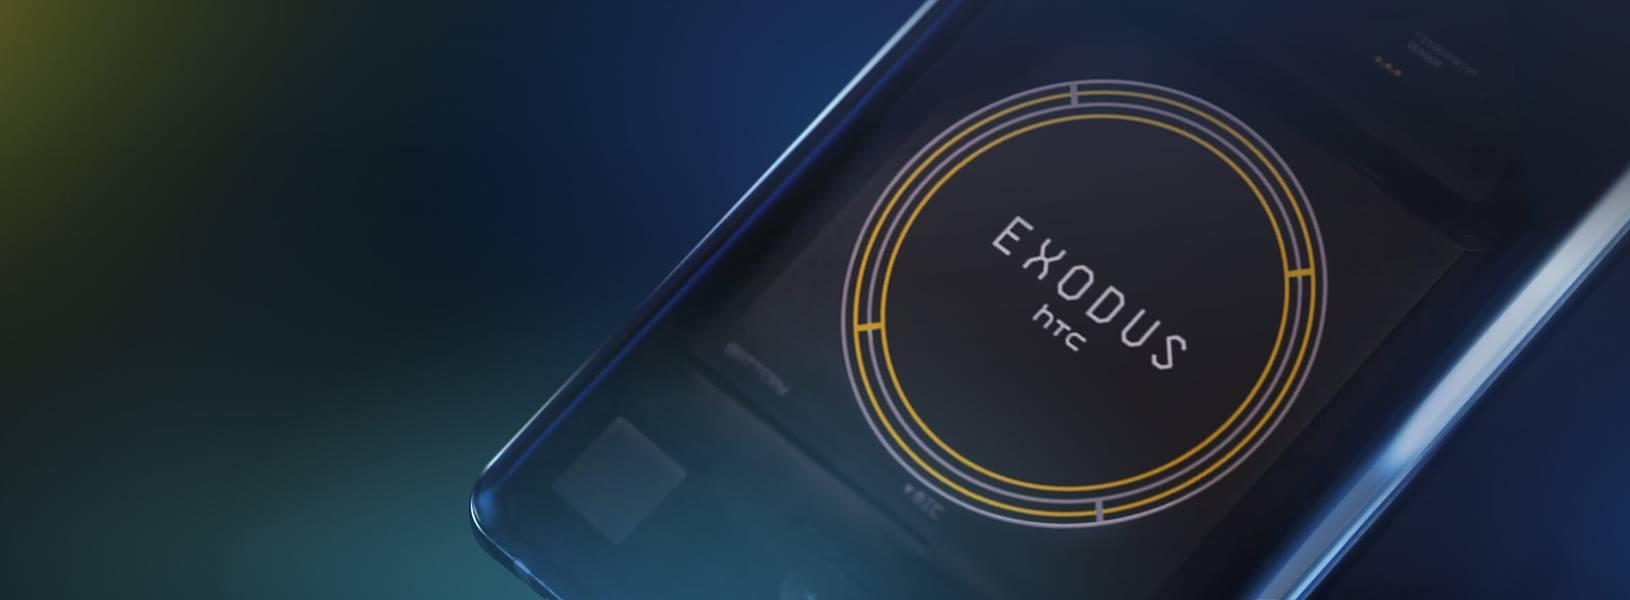 HTC Exodus 1 (4)